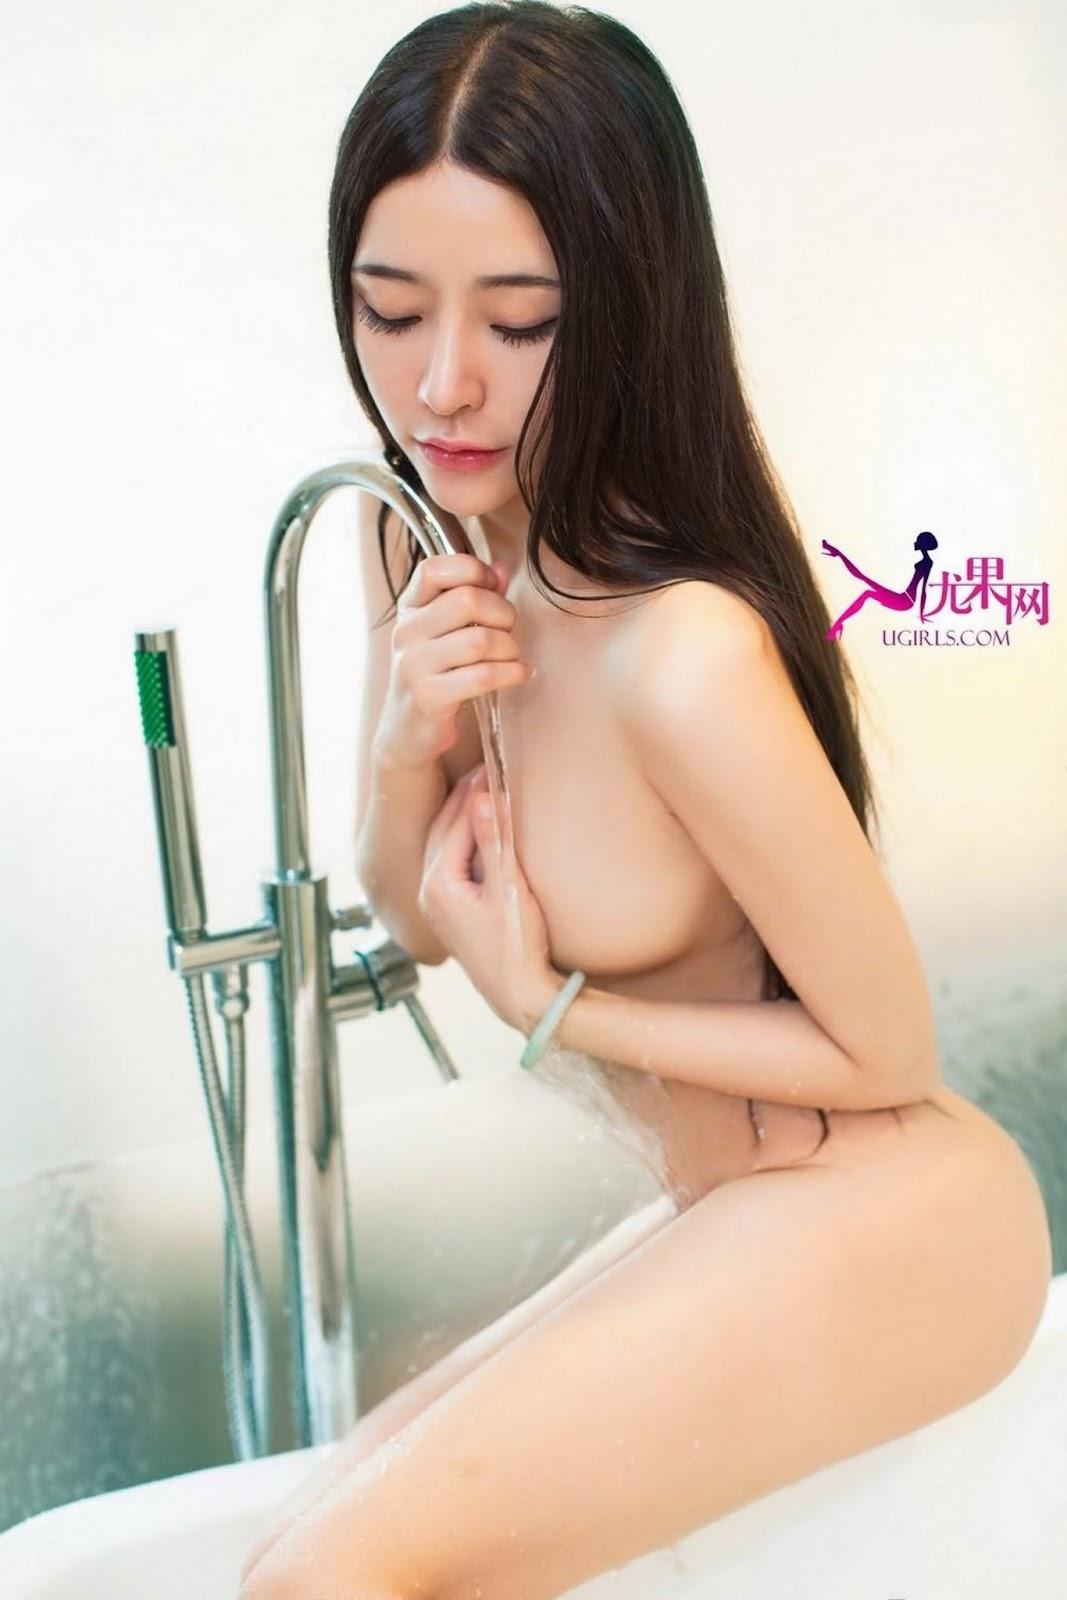 58 - Sexy Photo UGIRLS NO.103 Nude Girl